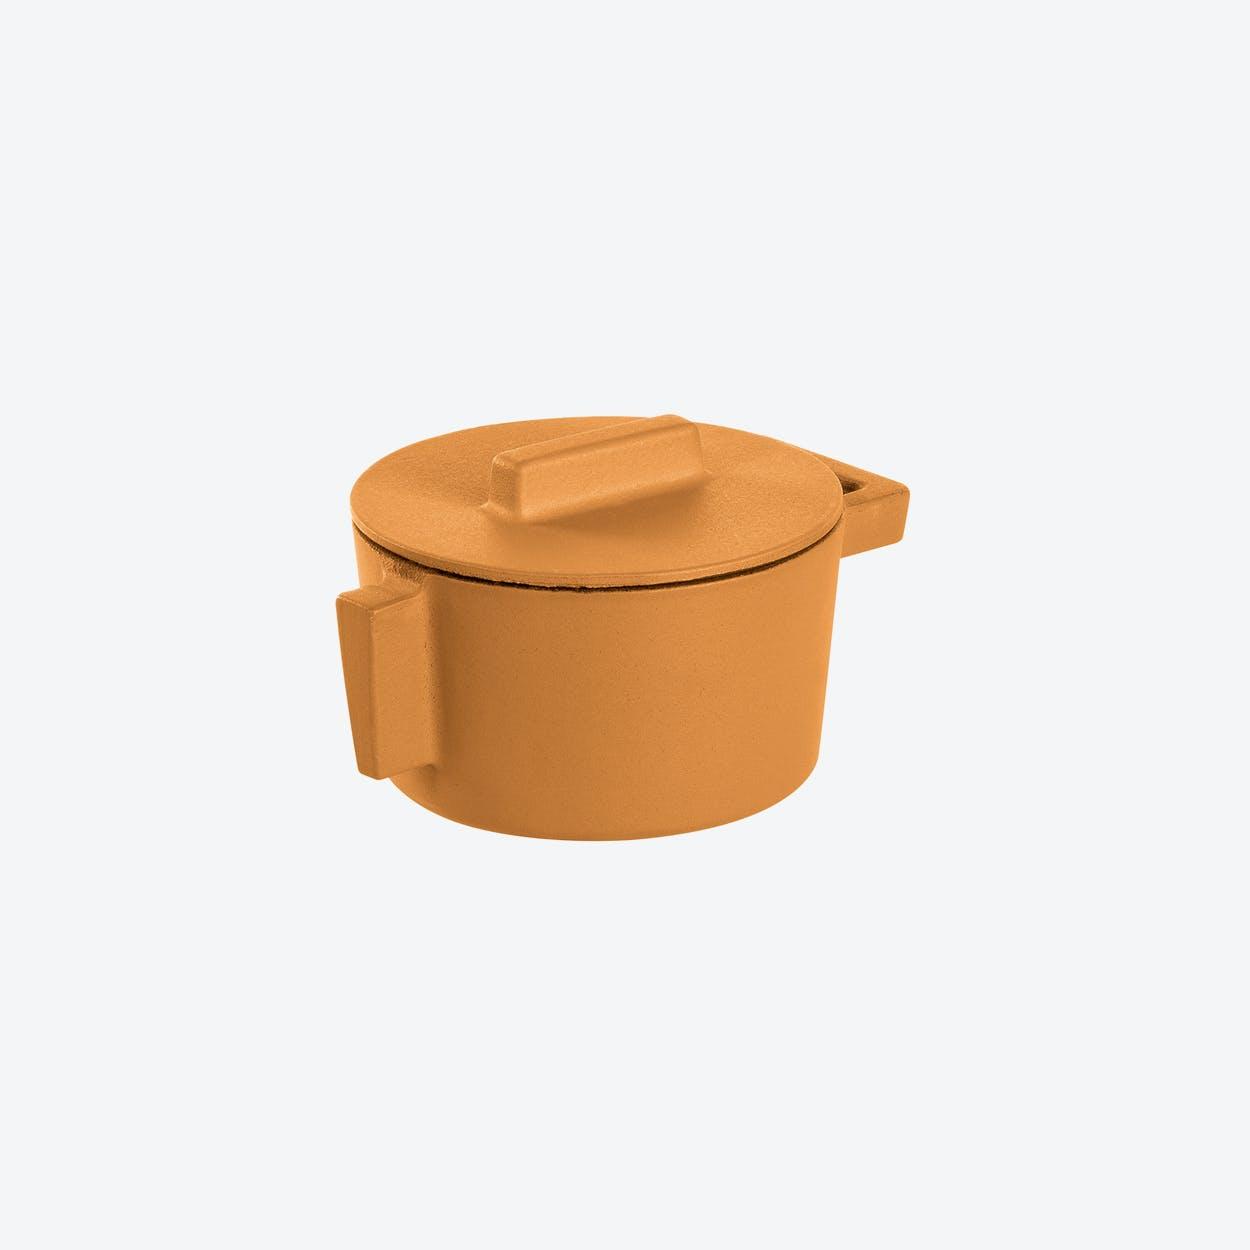 TerraCotto Cast Iron Saucepot w/ Lid in Vanilla (10ø cm)